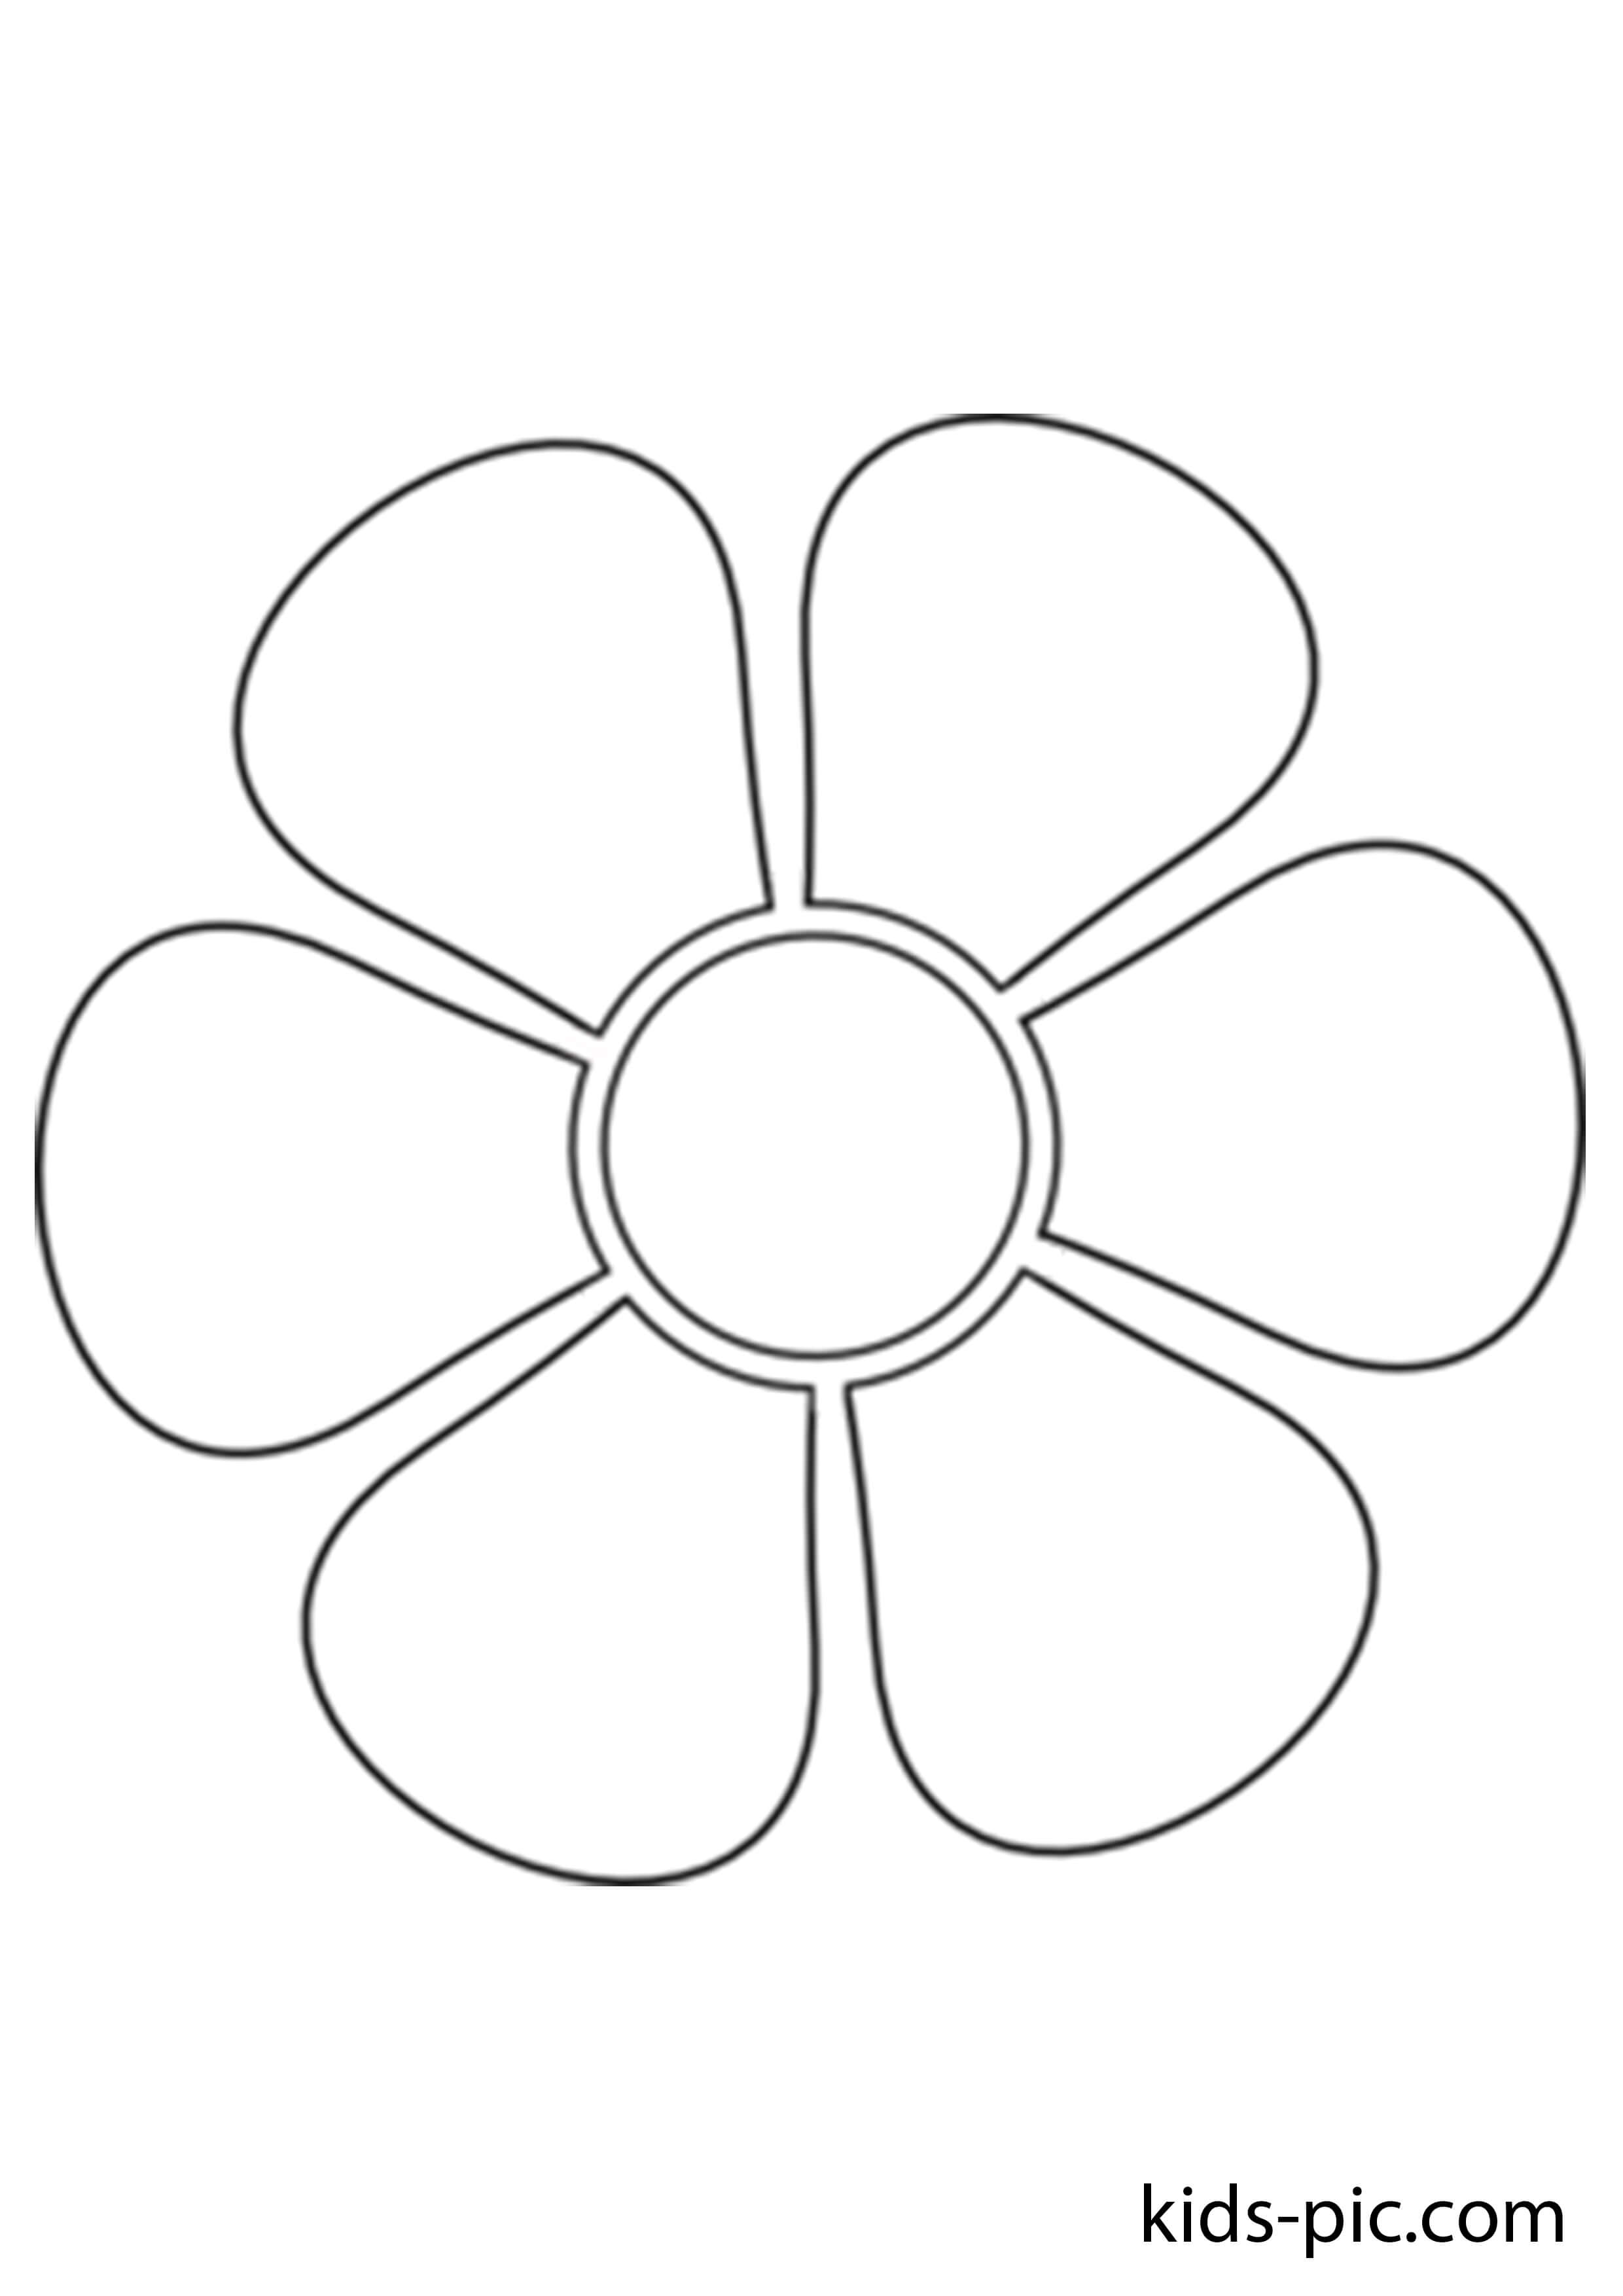 Картинка с ромашкой шаблон